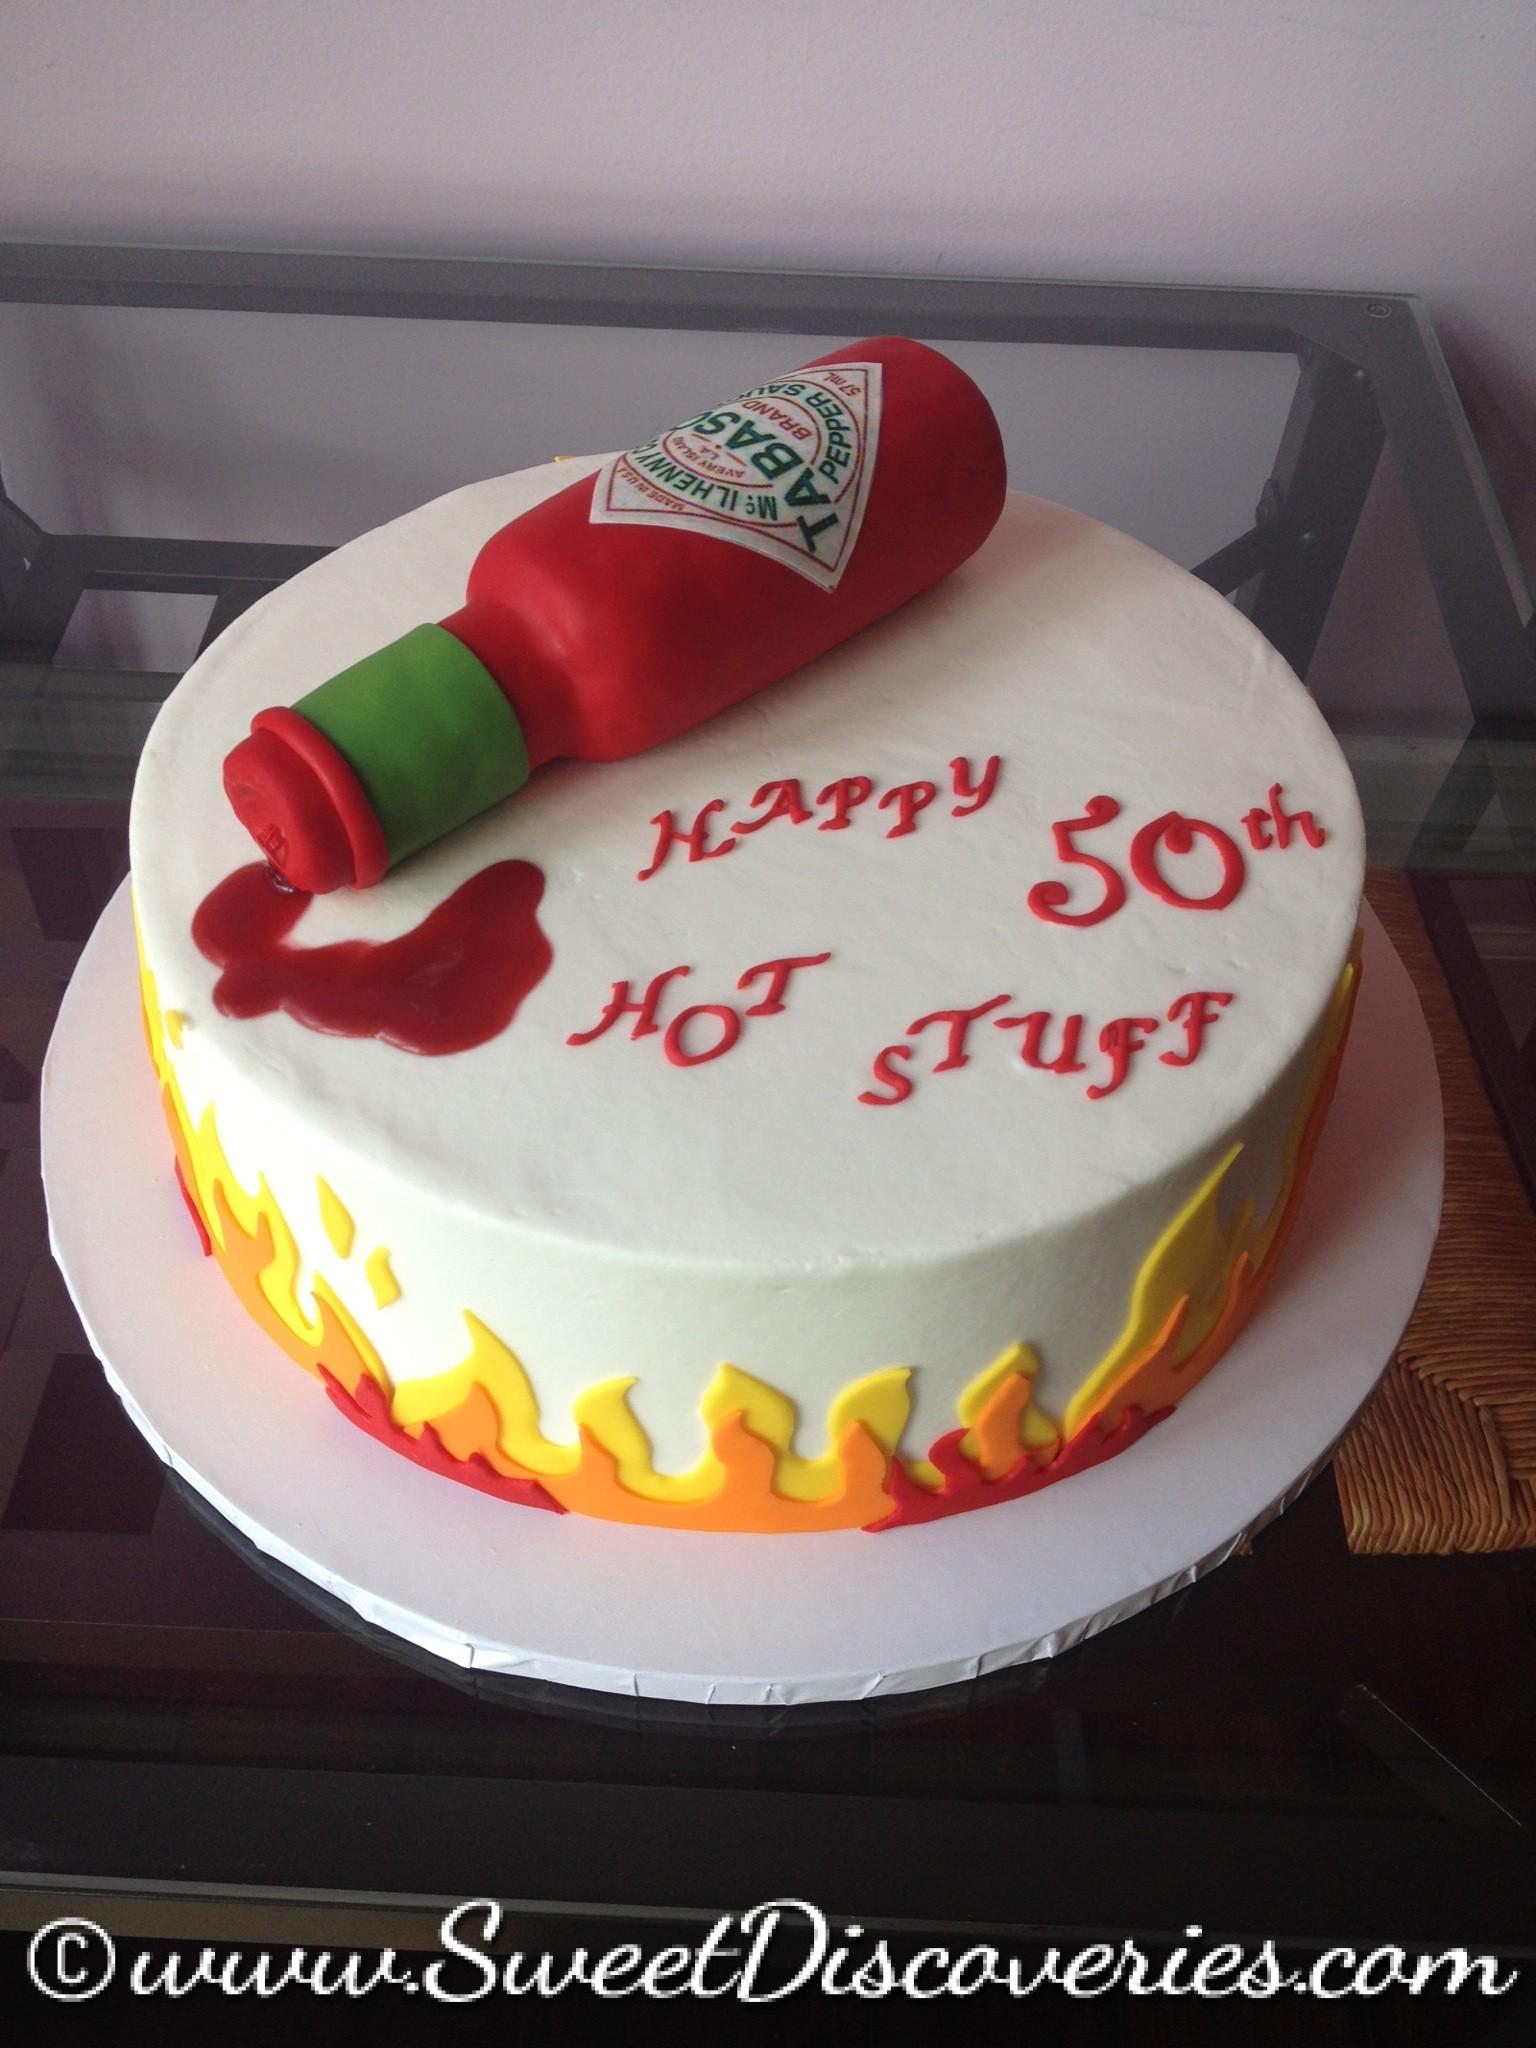 Hot Stuff Birthday Cake Sweet Discoveries